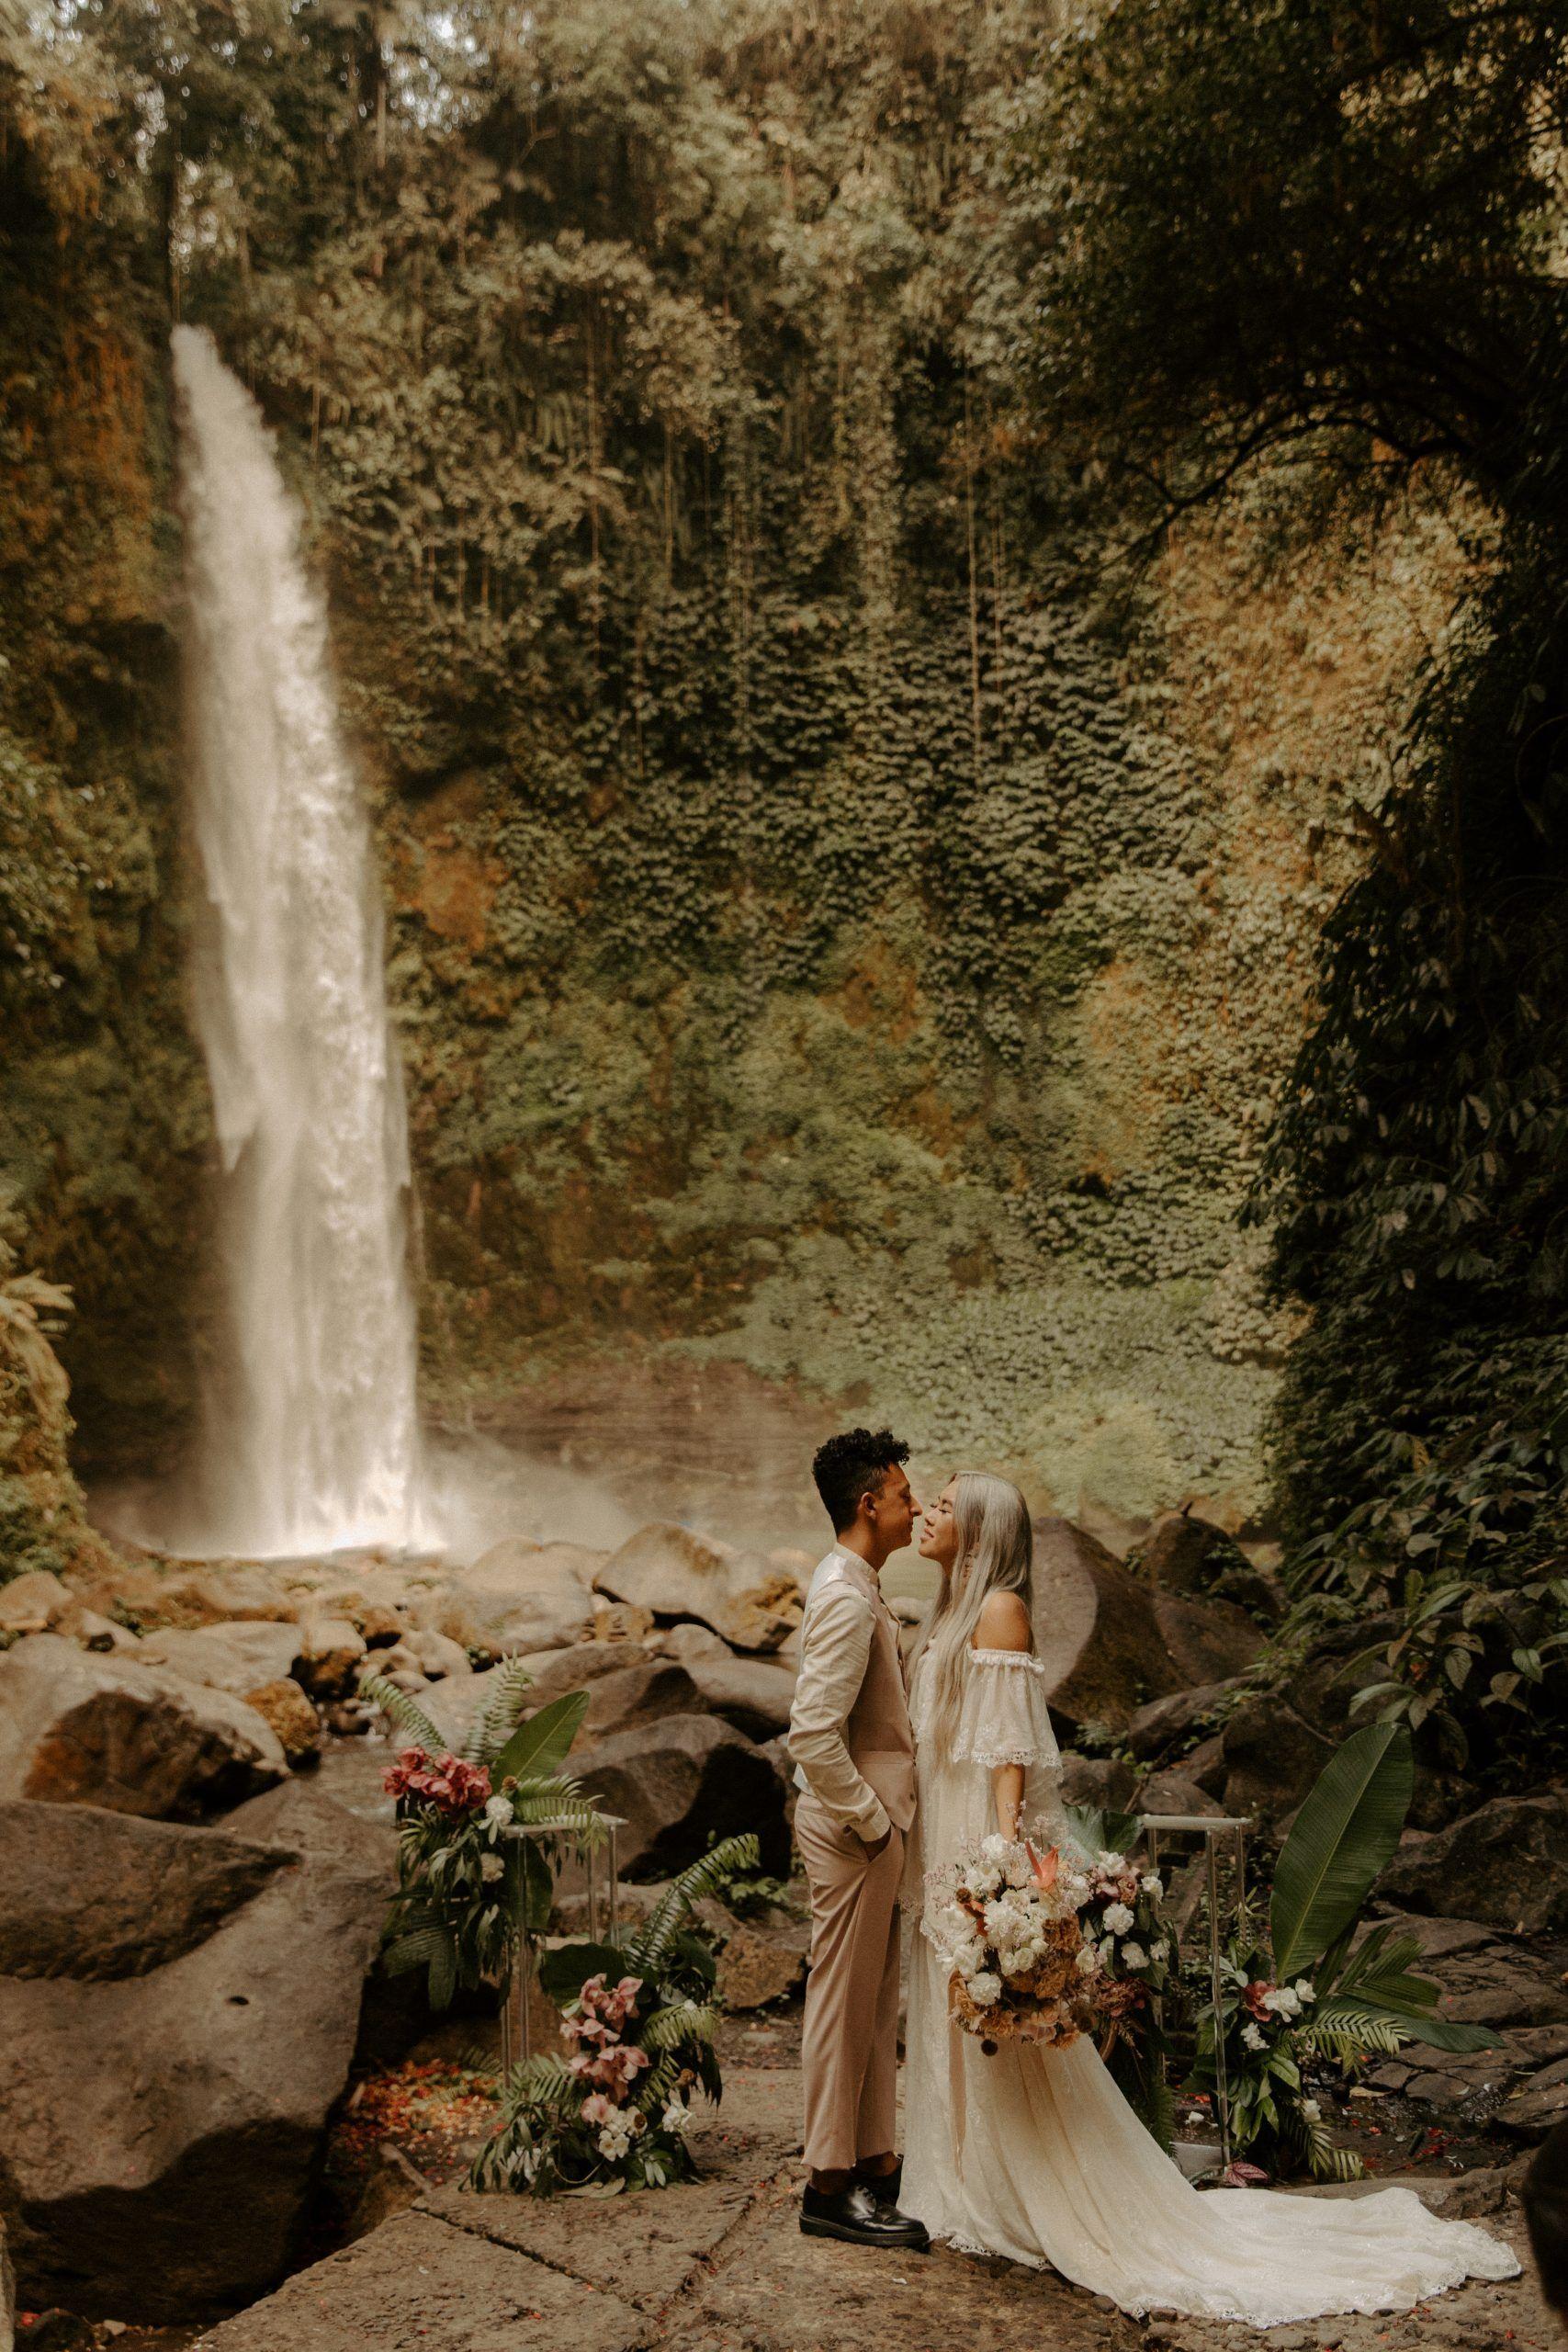 Rice Fields Adventure and Waterfall Elopement Canggu